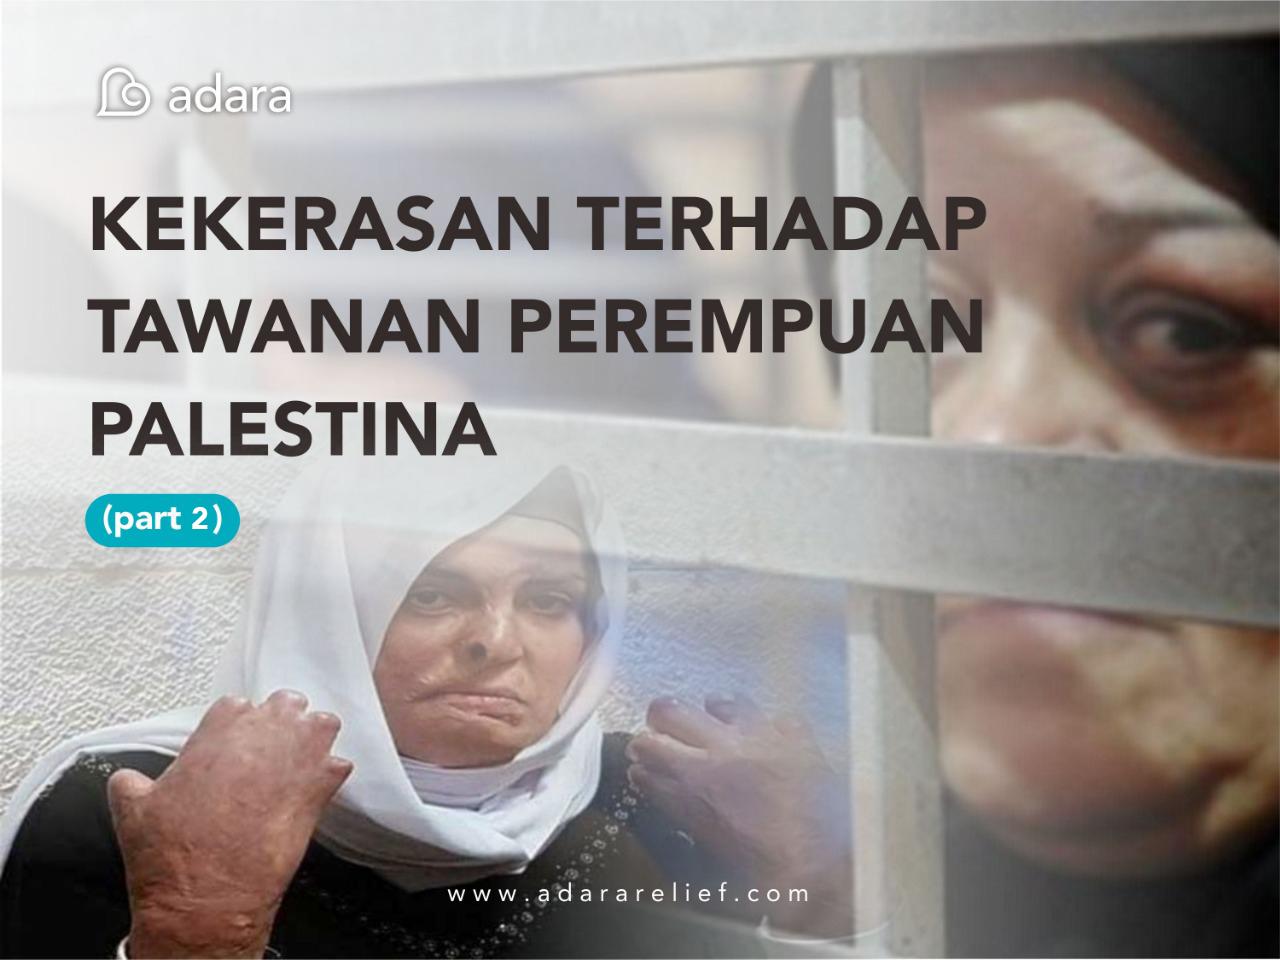 Tawanan Perempuan Palestina : Cerita Penderitaan dan Kekerasan Sejak Ditangkap Hingga di Penjara